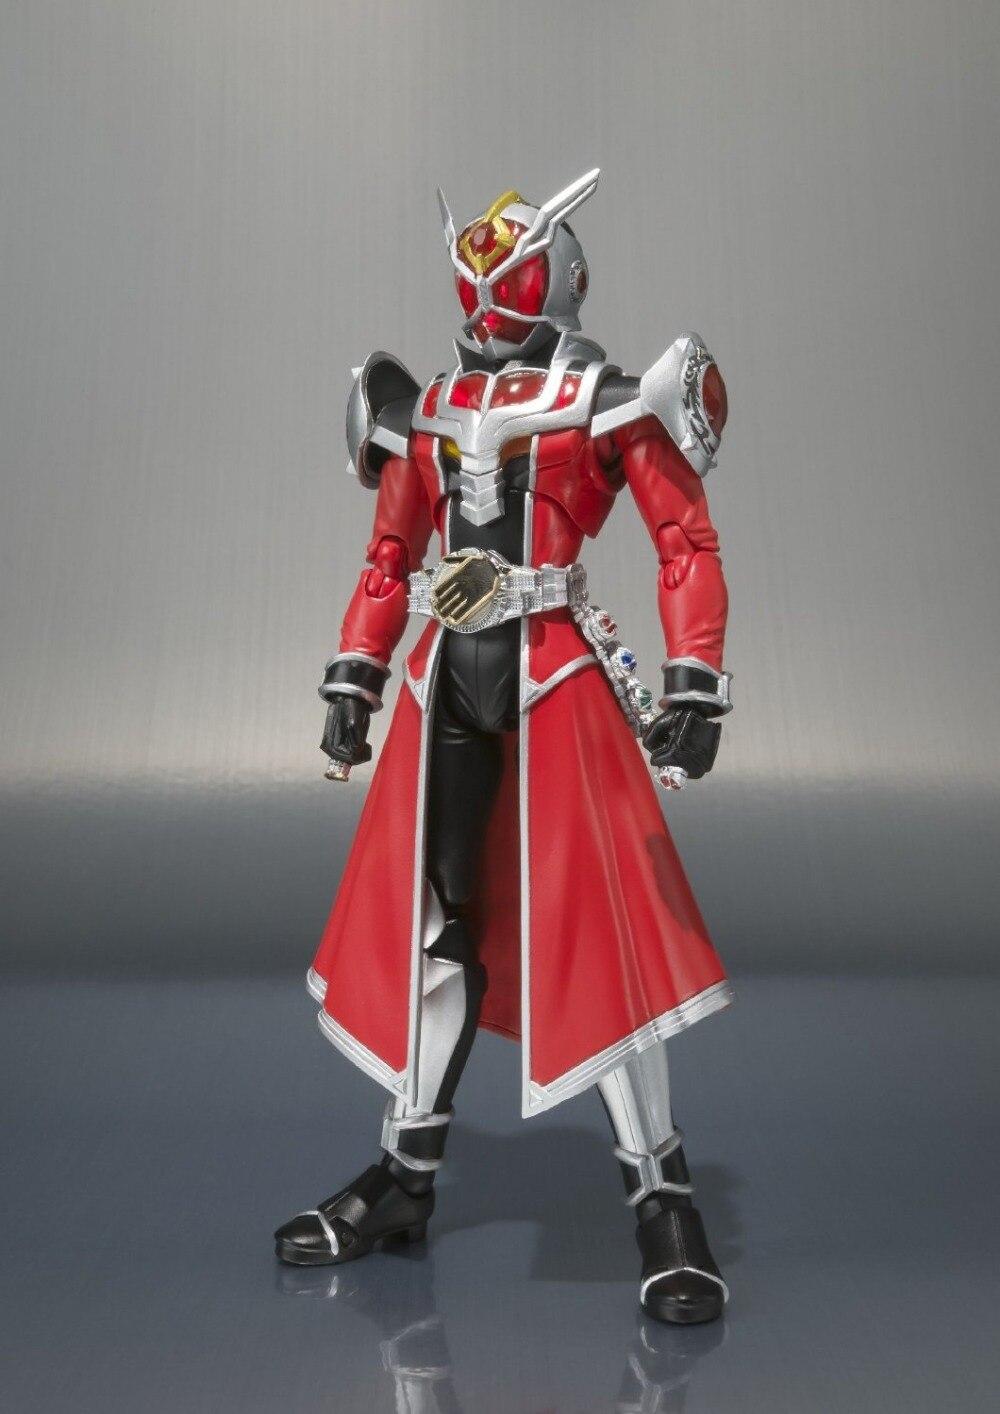 Japan Kamen Rider Wizard Original BANDAI Tamashii Nations SHF/ S.H.Figuarts Toy Action Figure - Flame Dragon